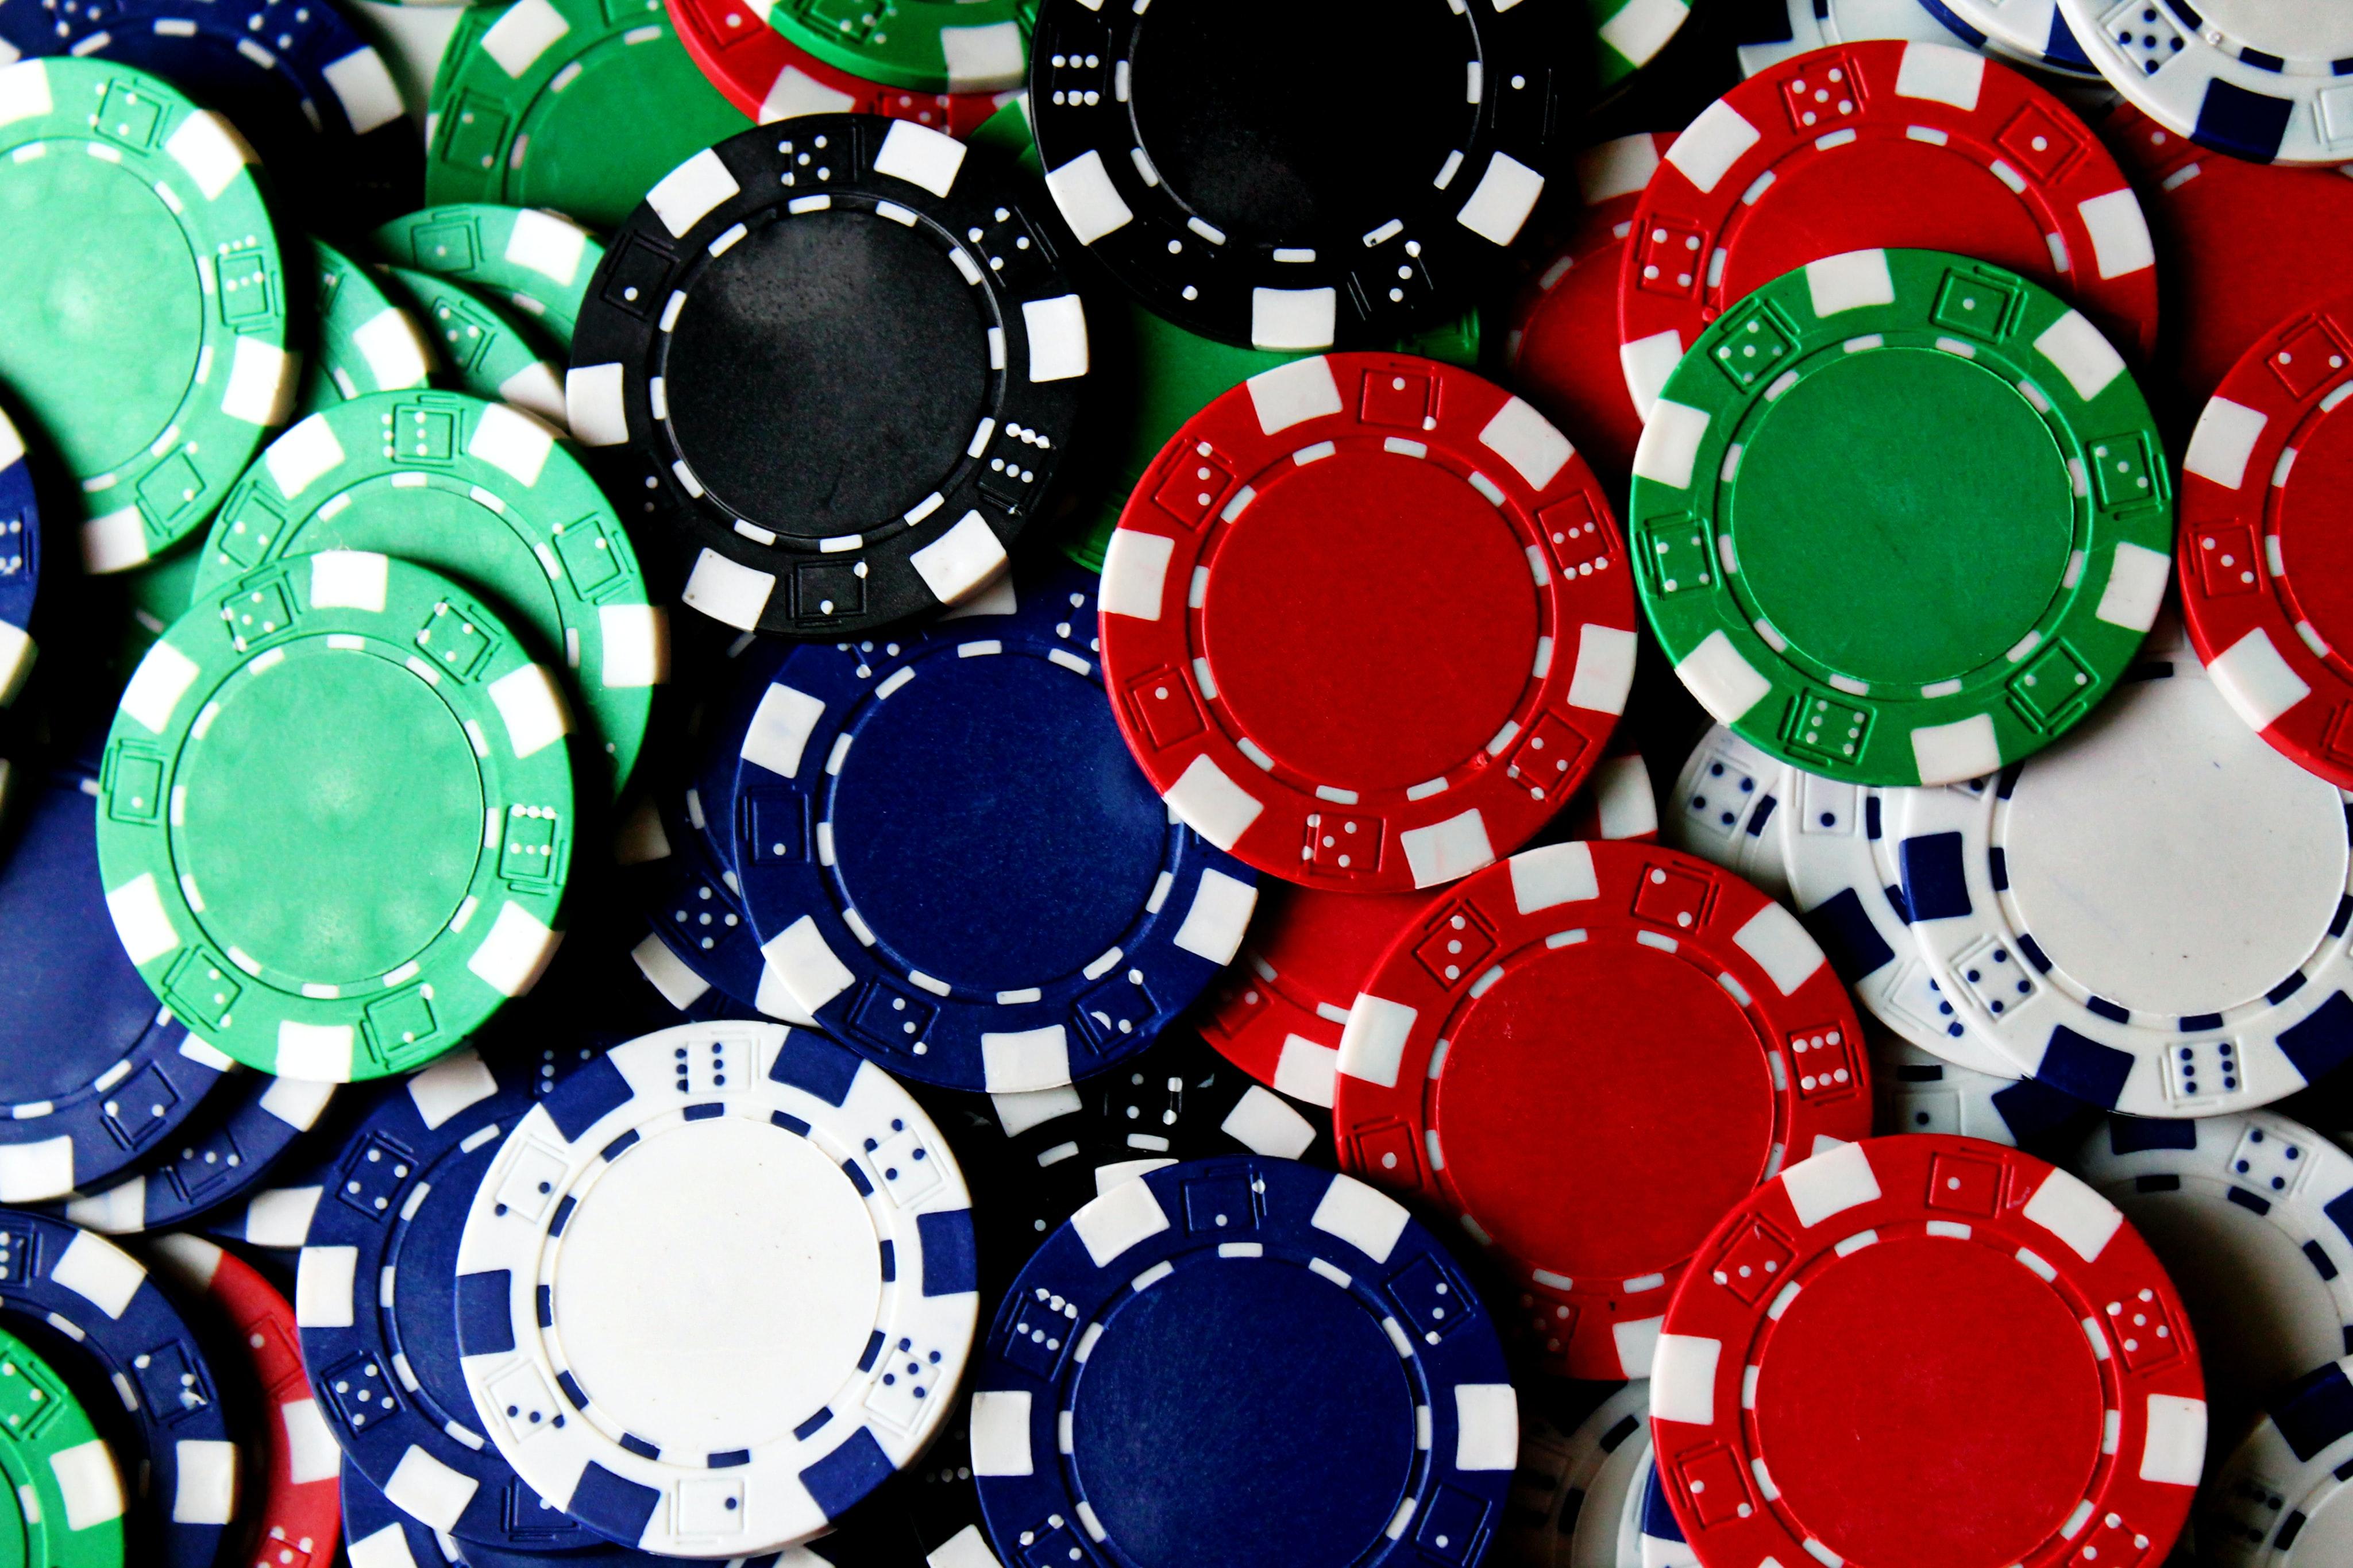 Poker Chips Pictures Download Free Images On Unsplash